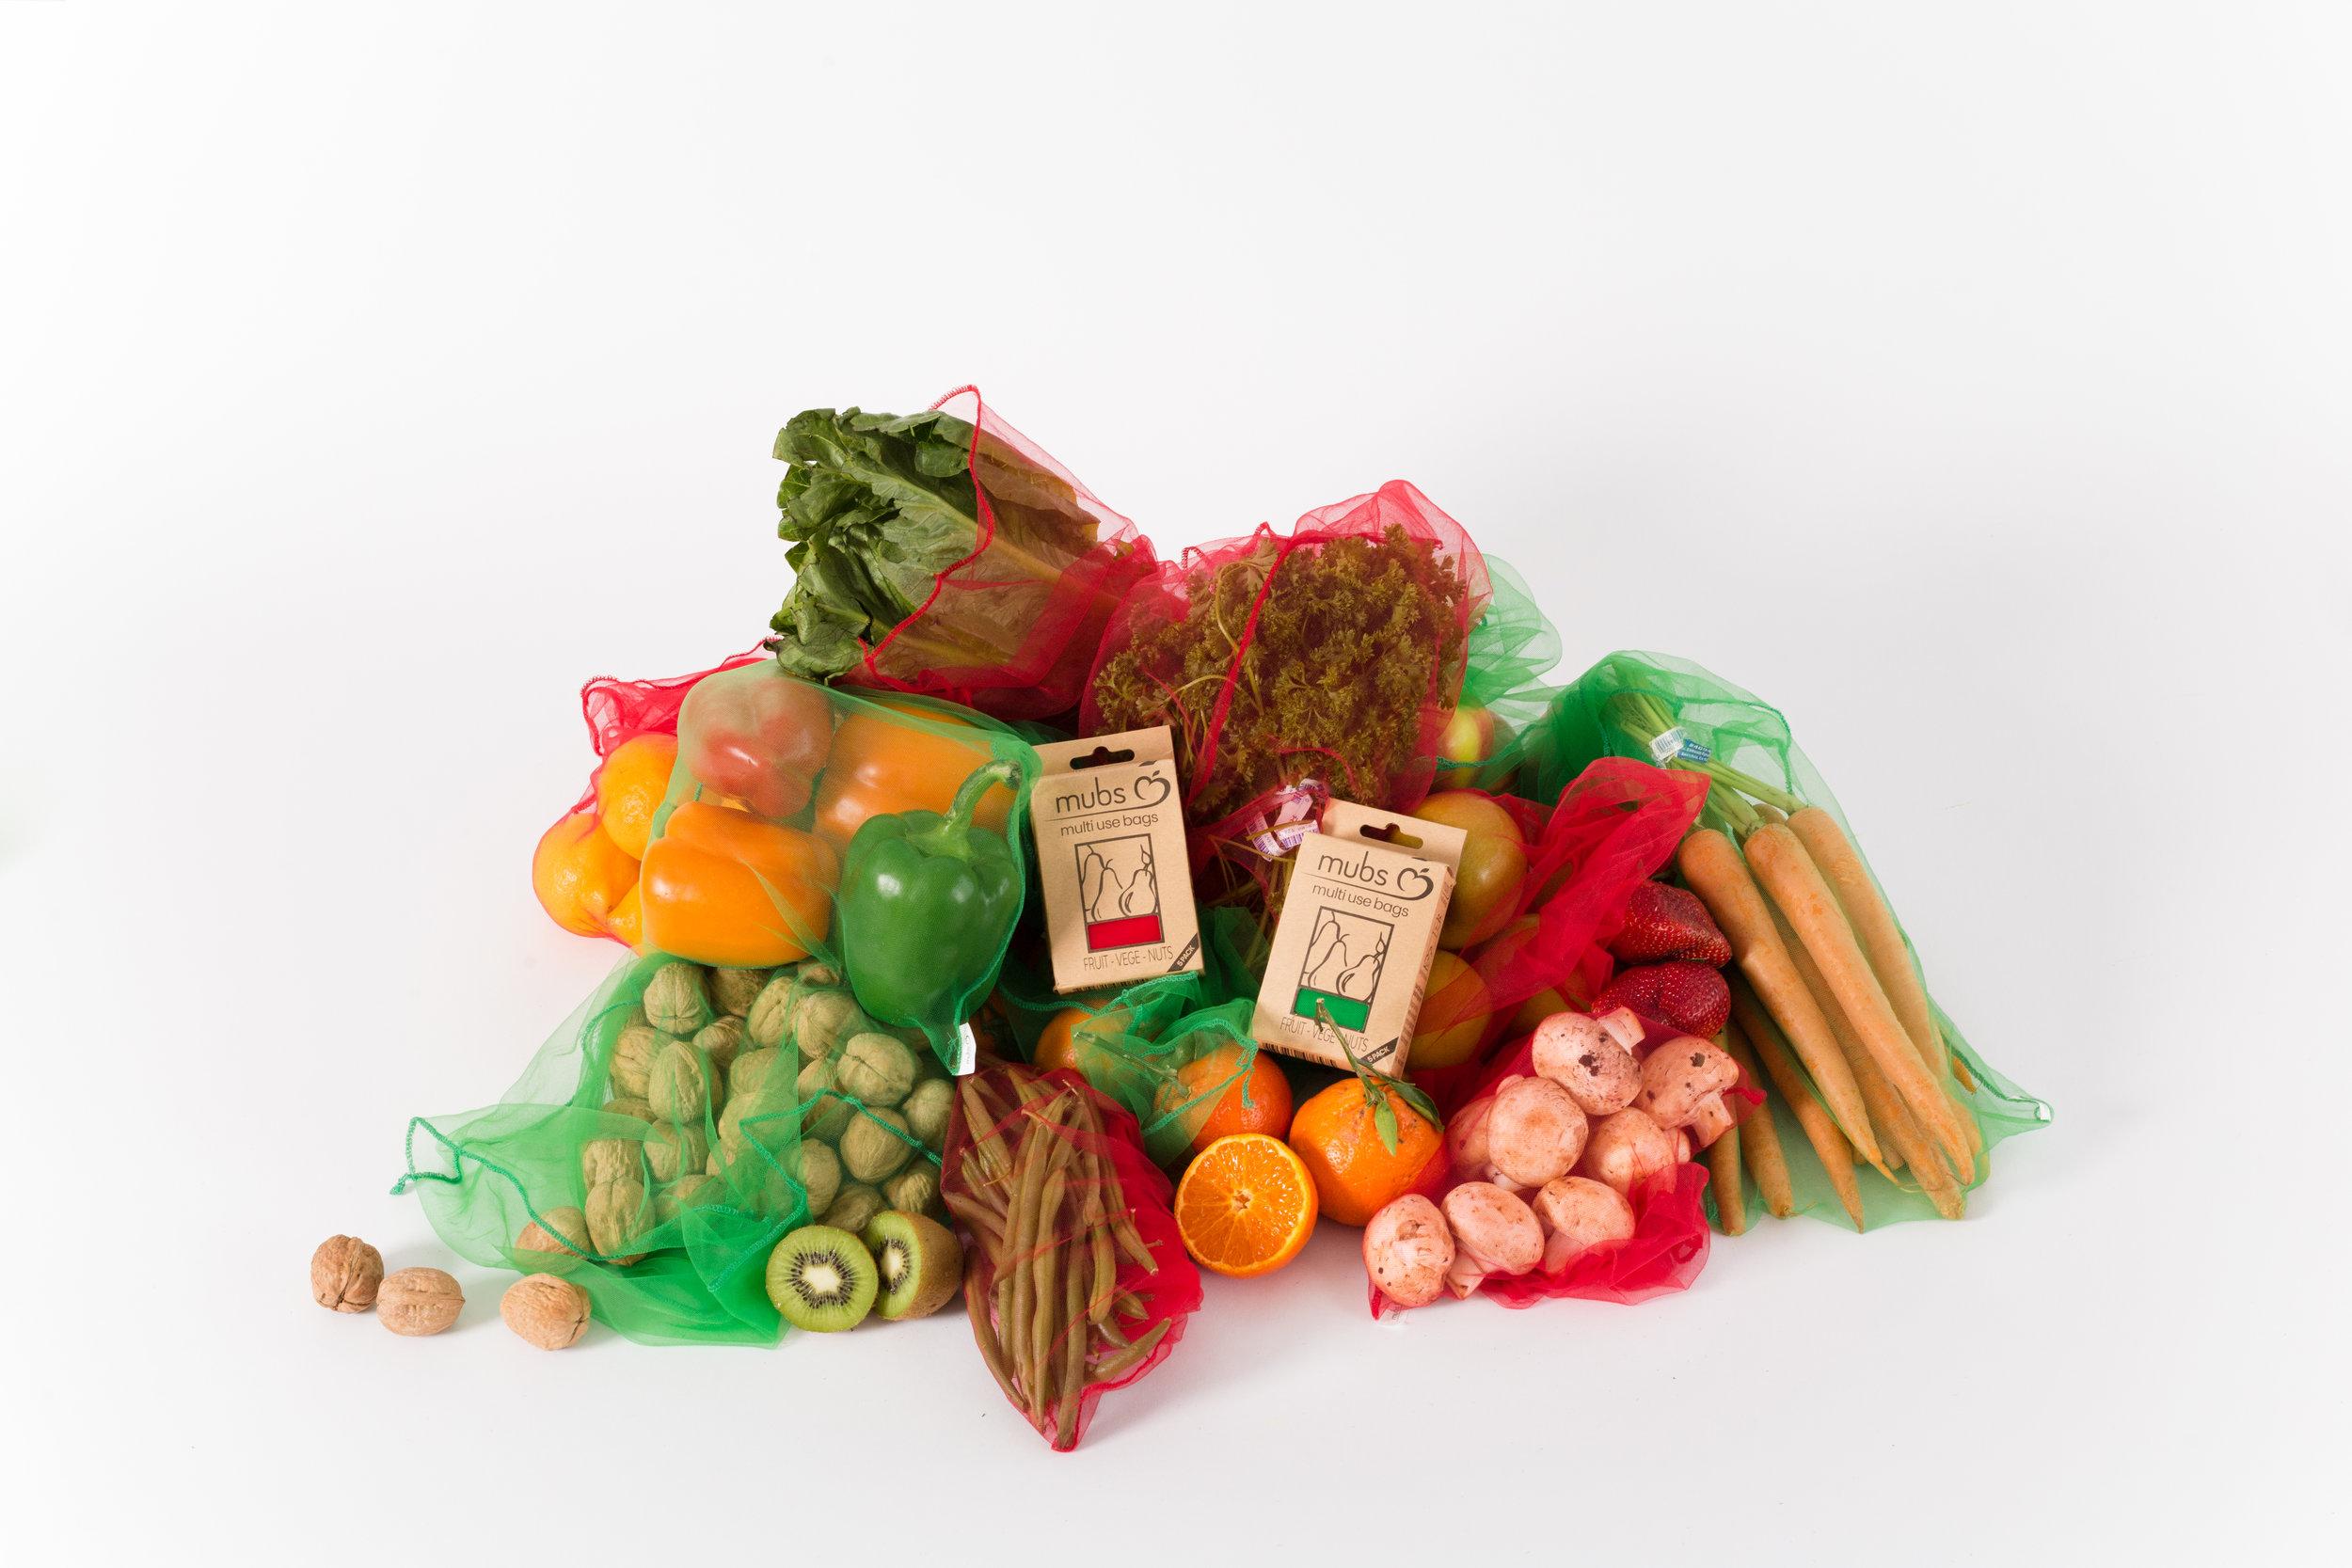 Reusable Produce Bags NZ - MUBs .jpg